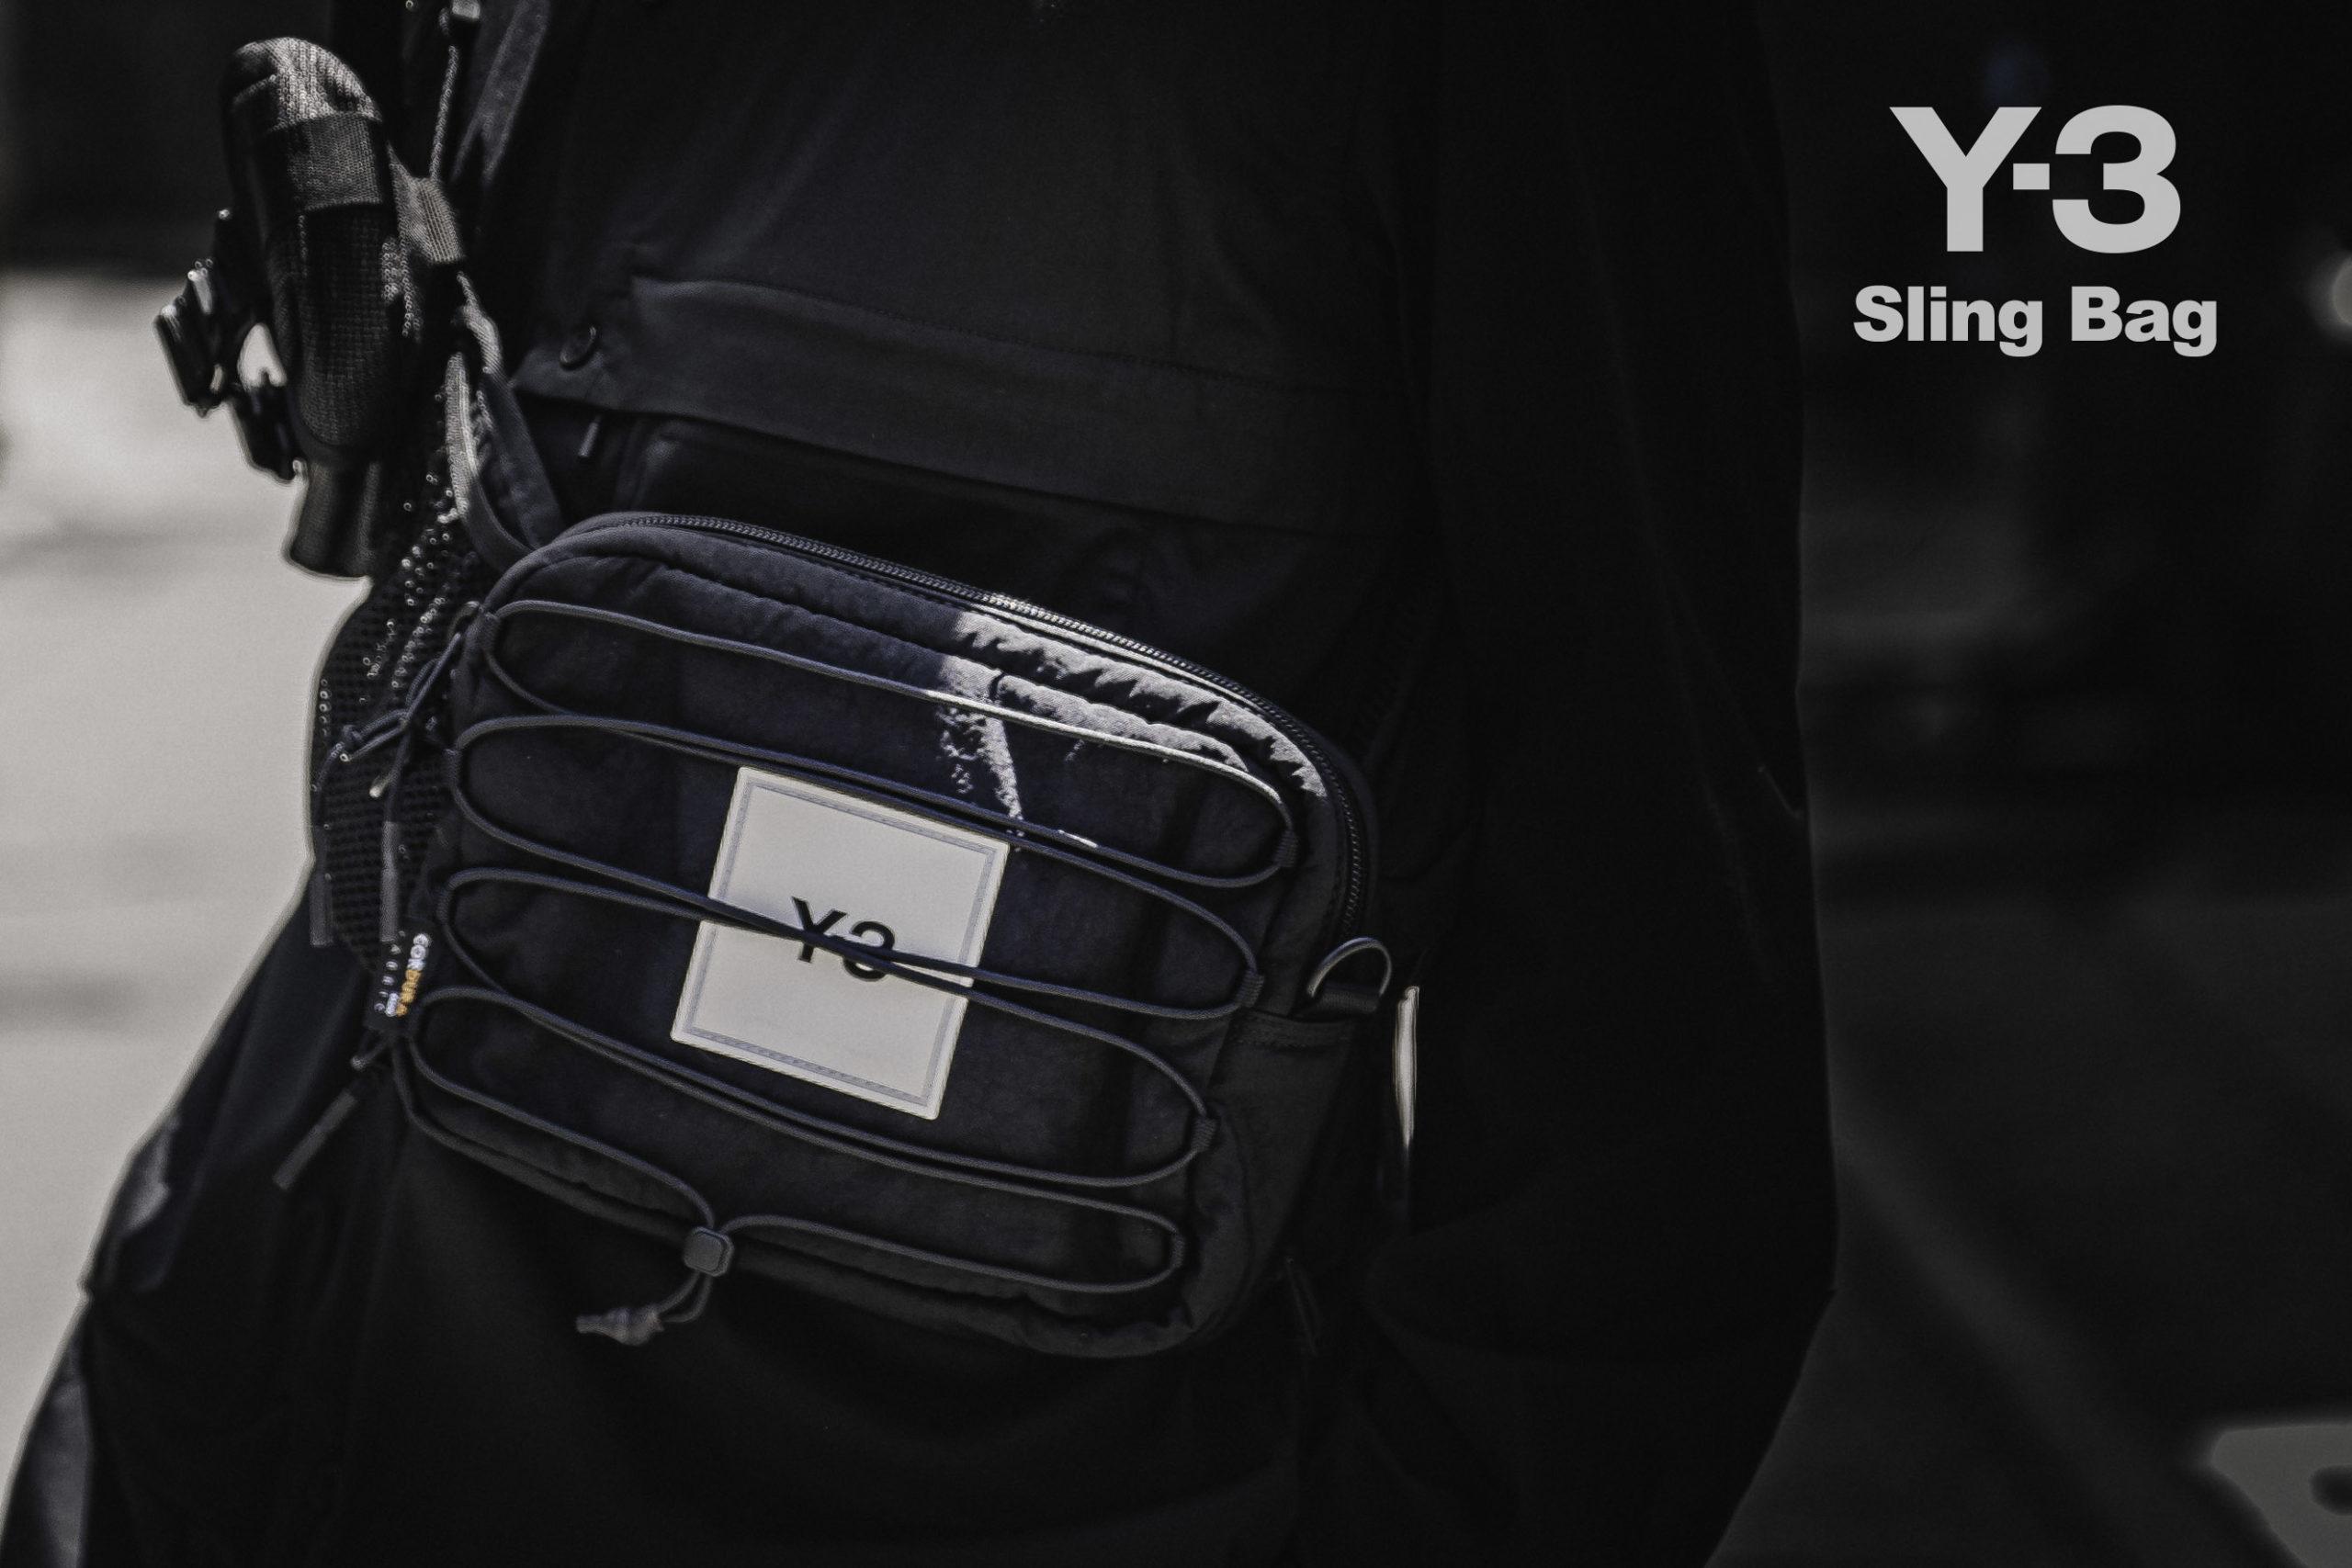 Y-3 21-22AW Sling Bag